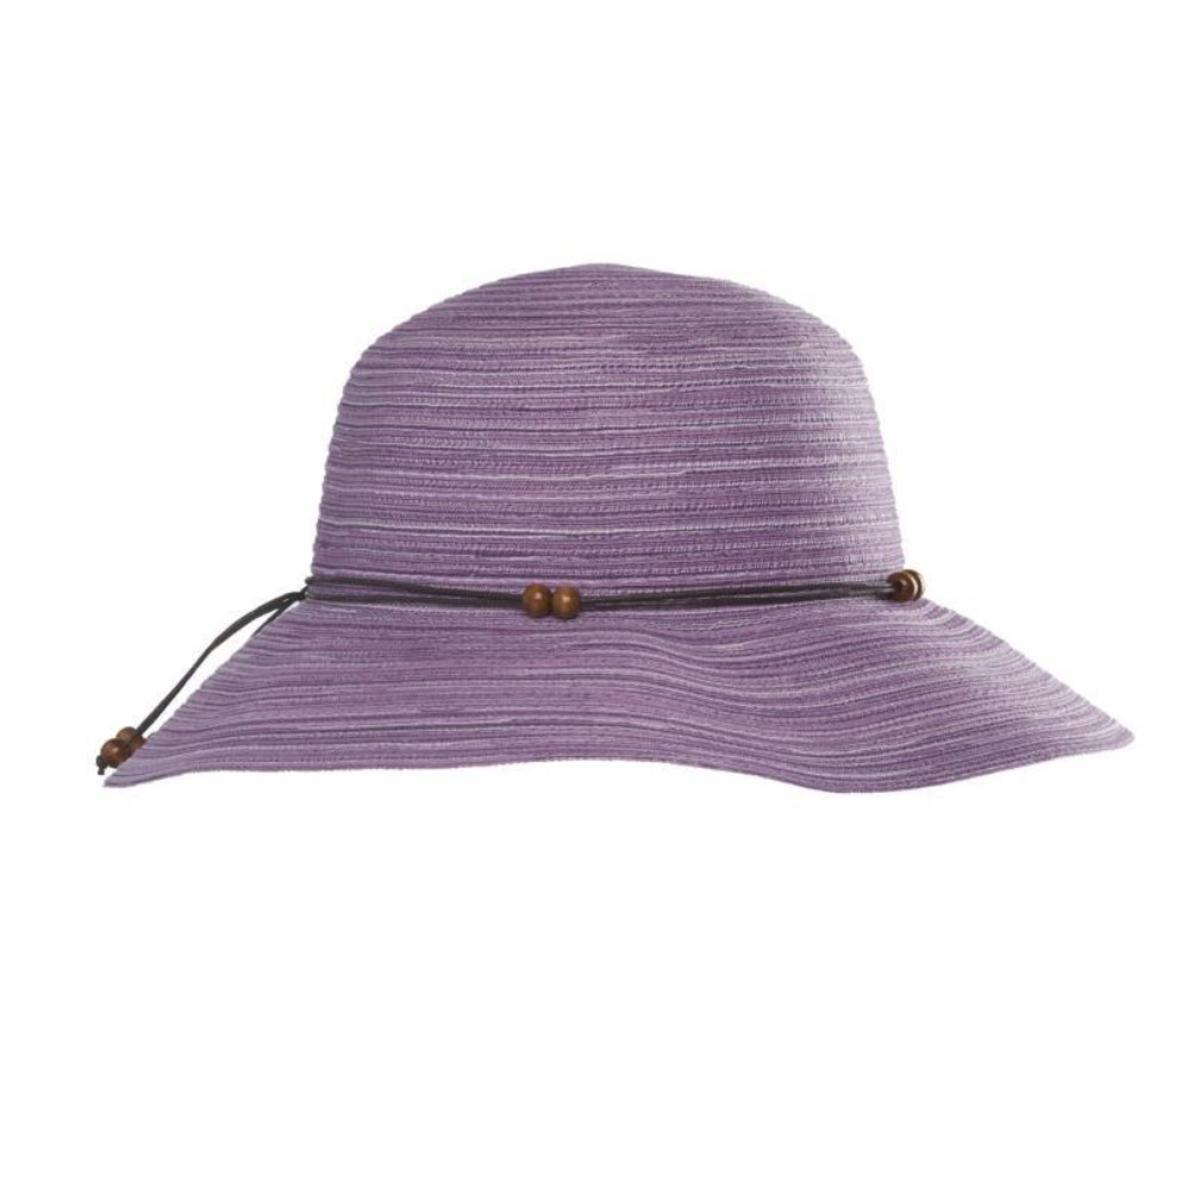 Amazon.com   CTR 1357106S M Summit Ladies Breeze Crushable Straw Hat ... f11c6f6707d6